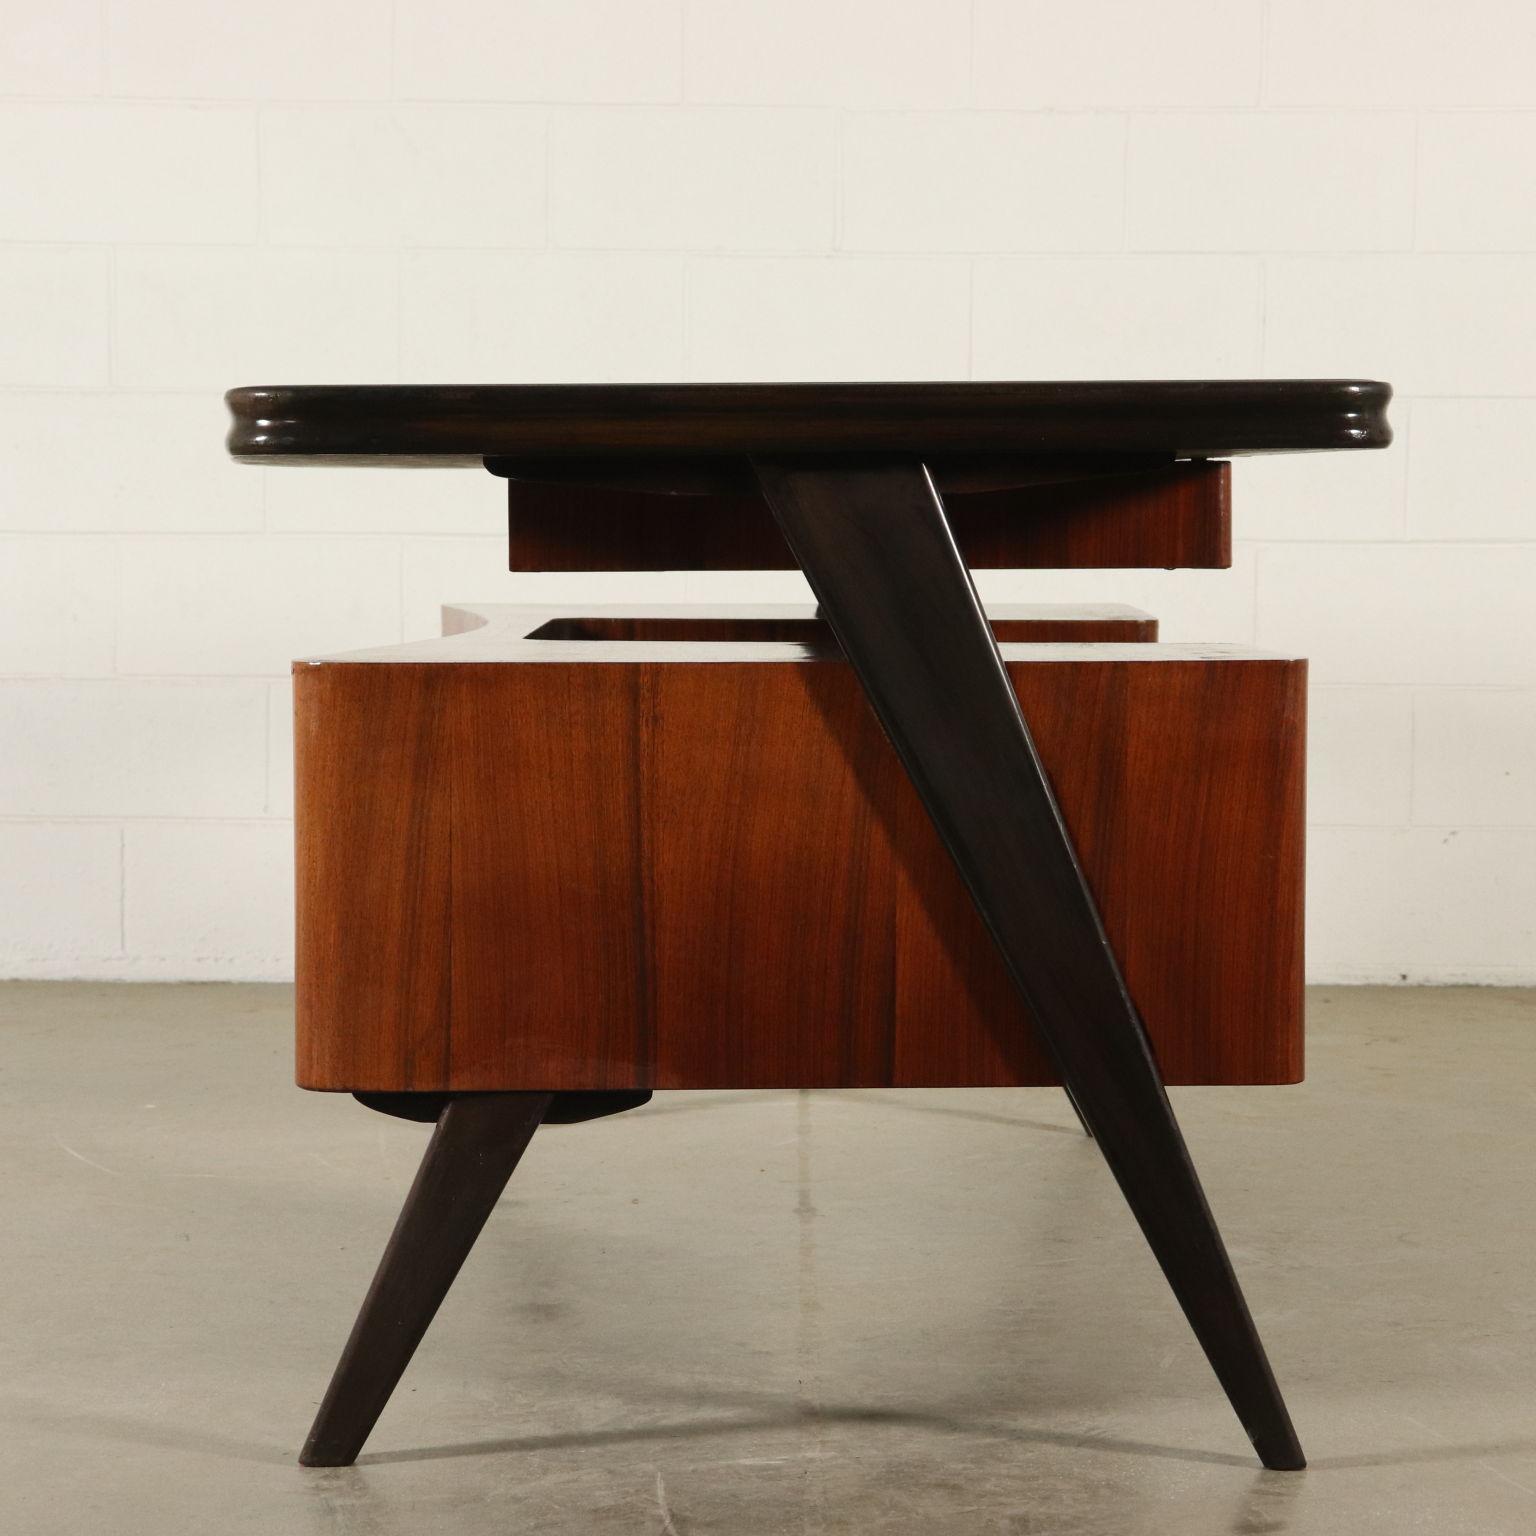 Scrivania Design Anni 50.Desk Rosewood Veneer Glass Vintage Italy 1950s Tables Modern Dimanoinmano It